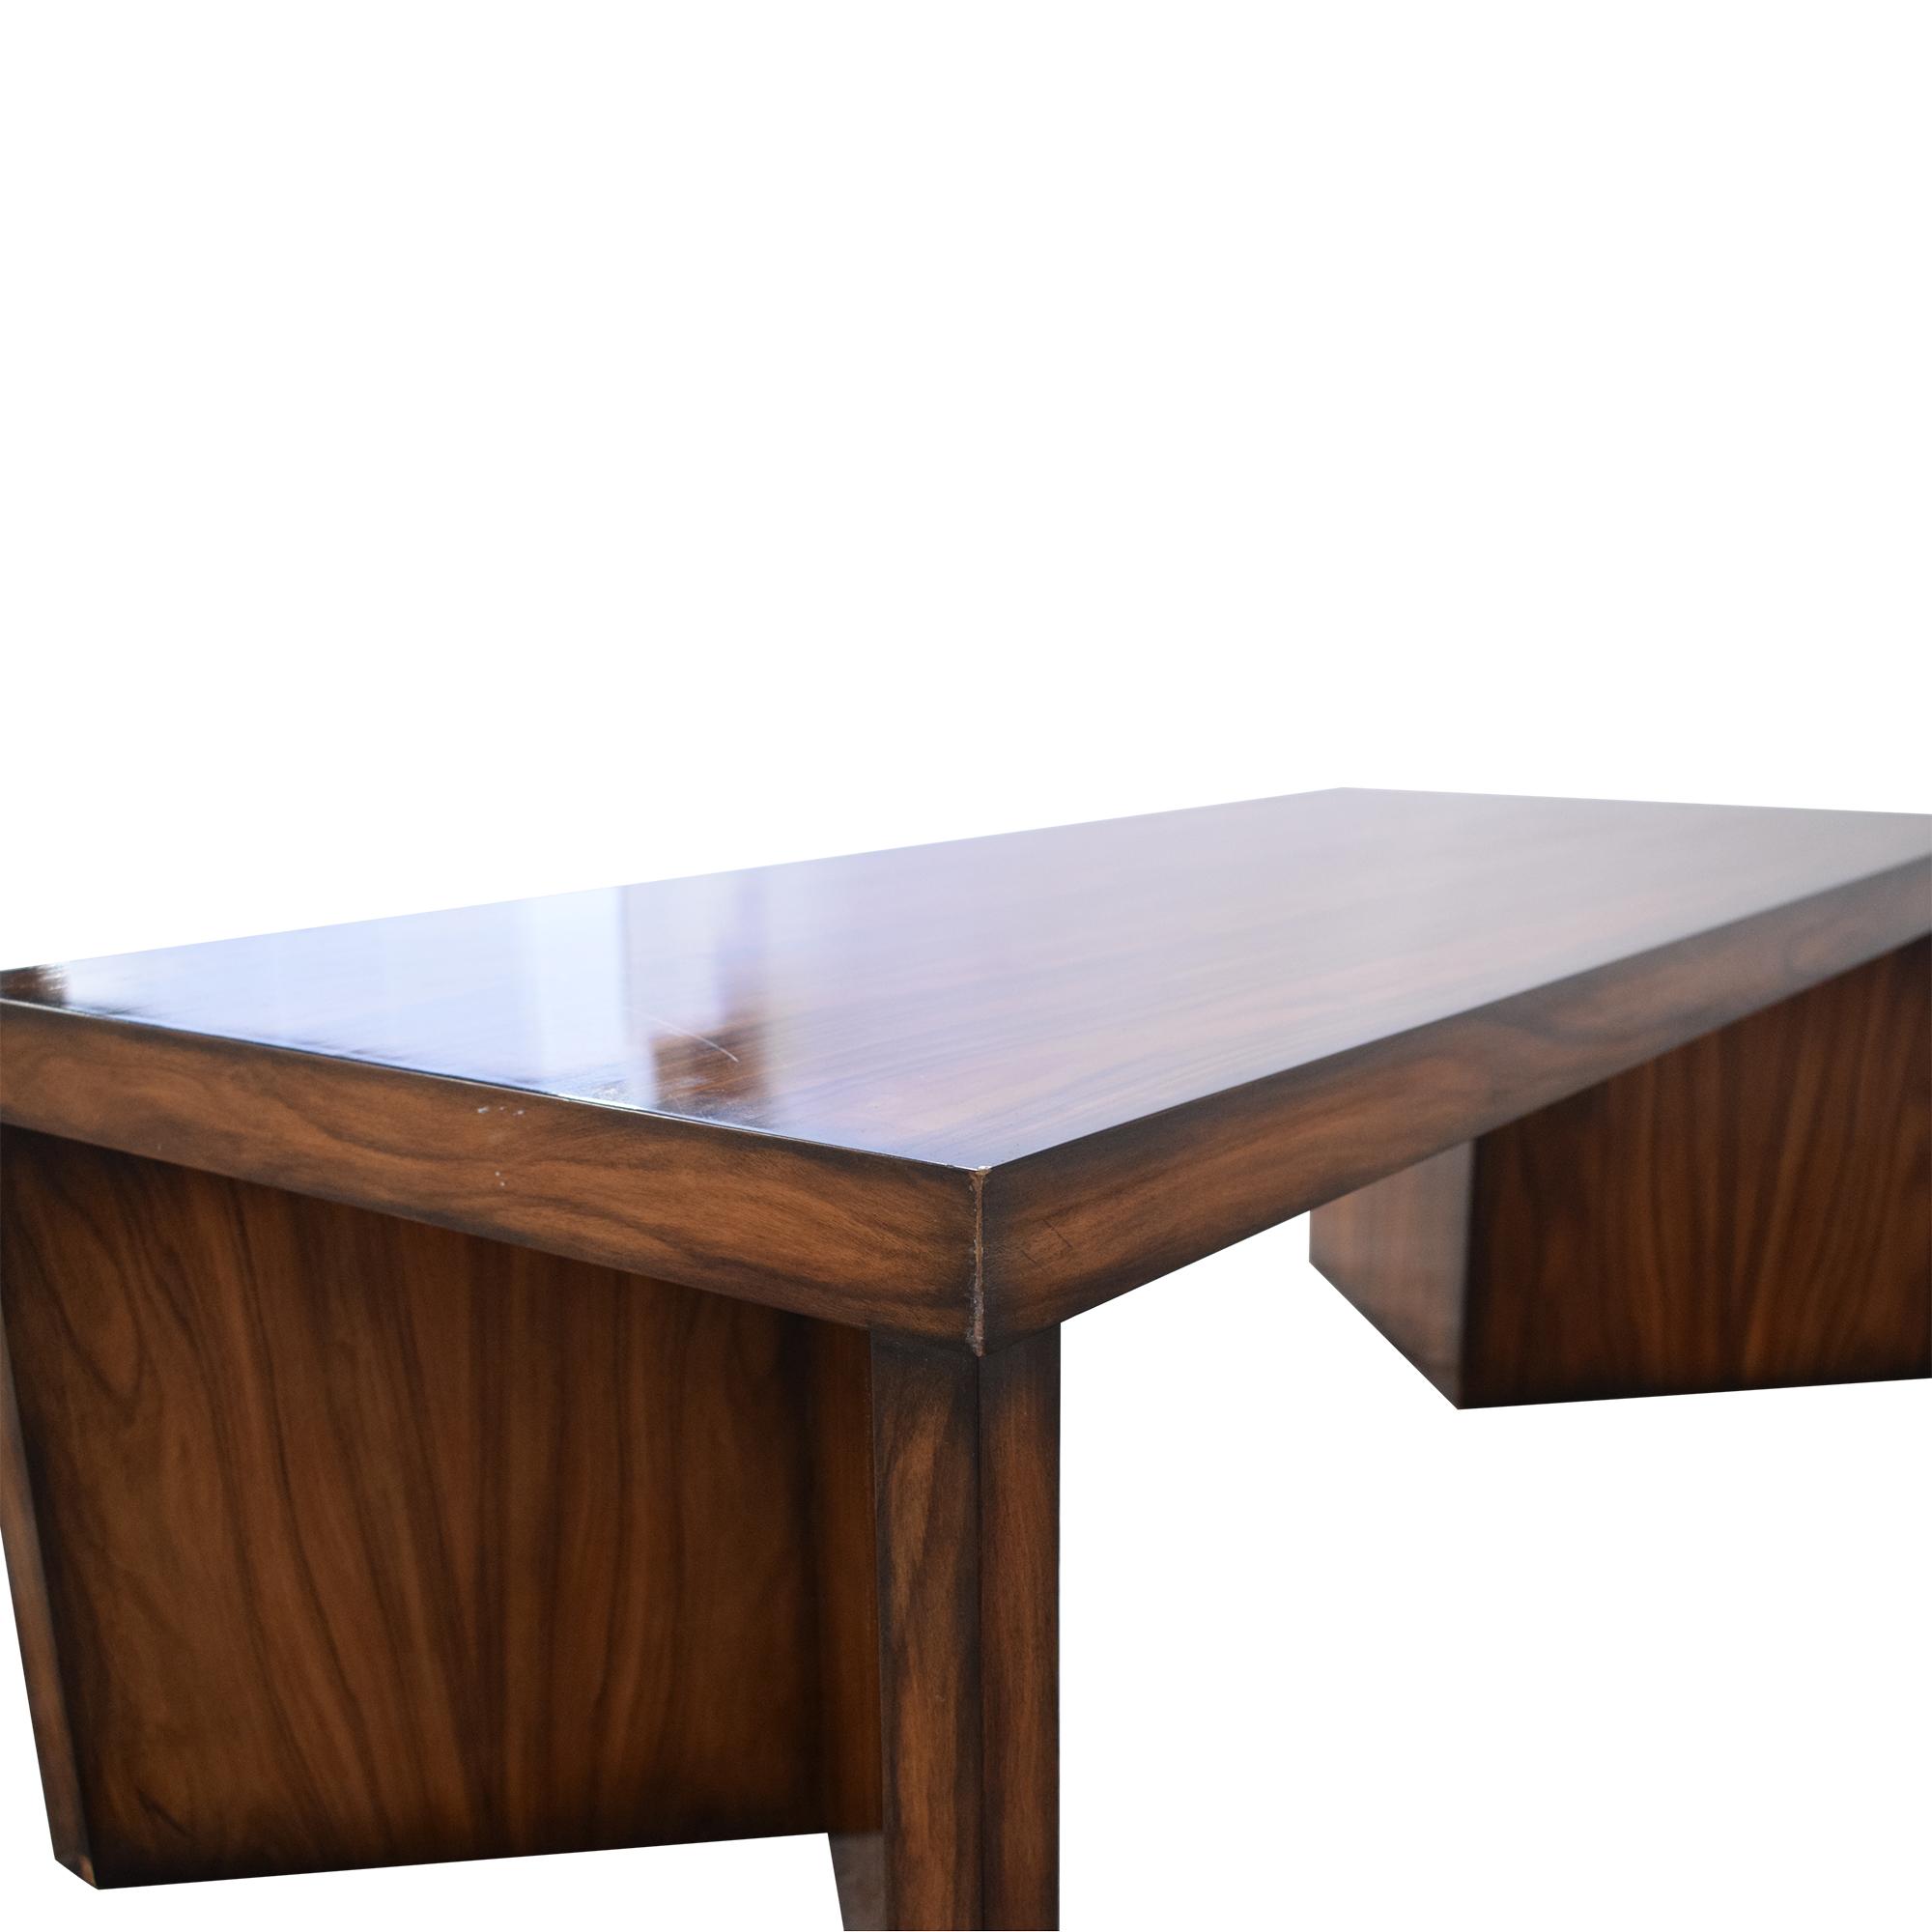 Kindel Kindel Rosewood Coffee Table discount